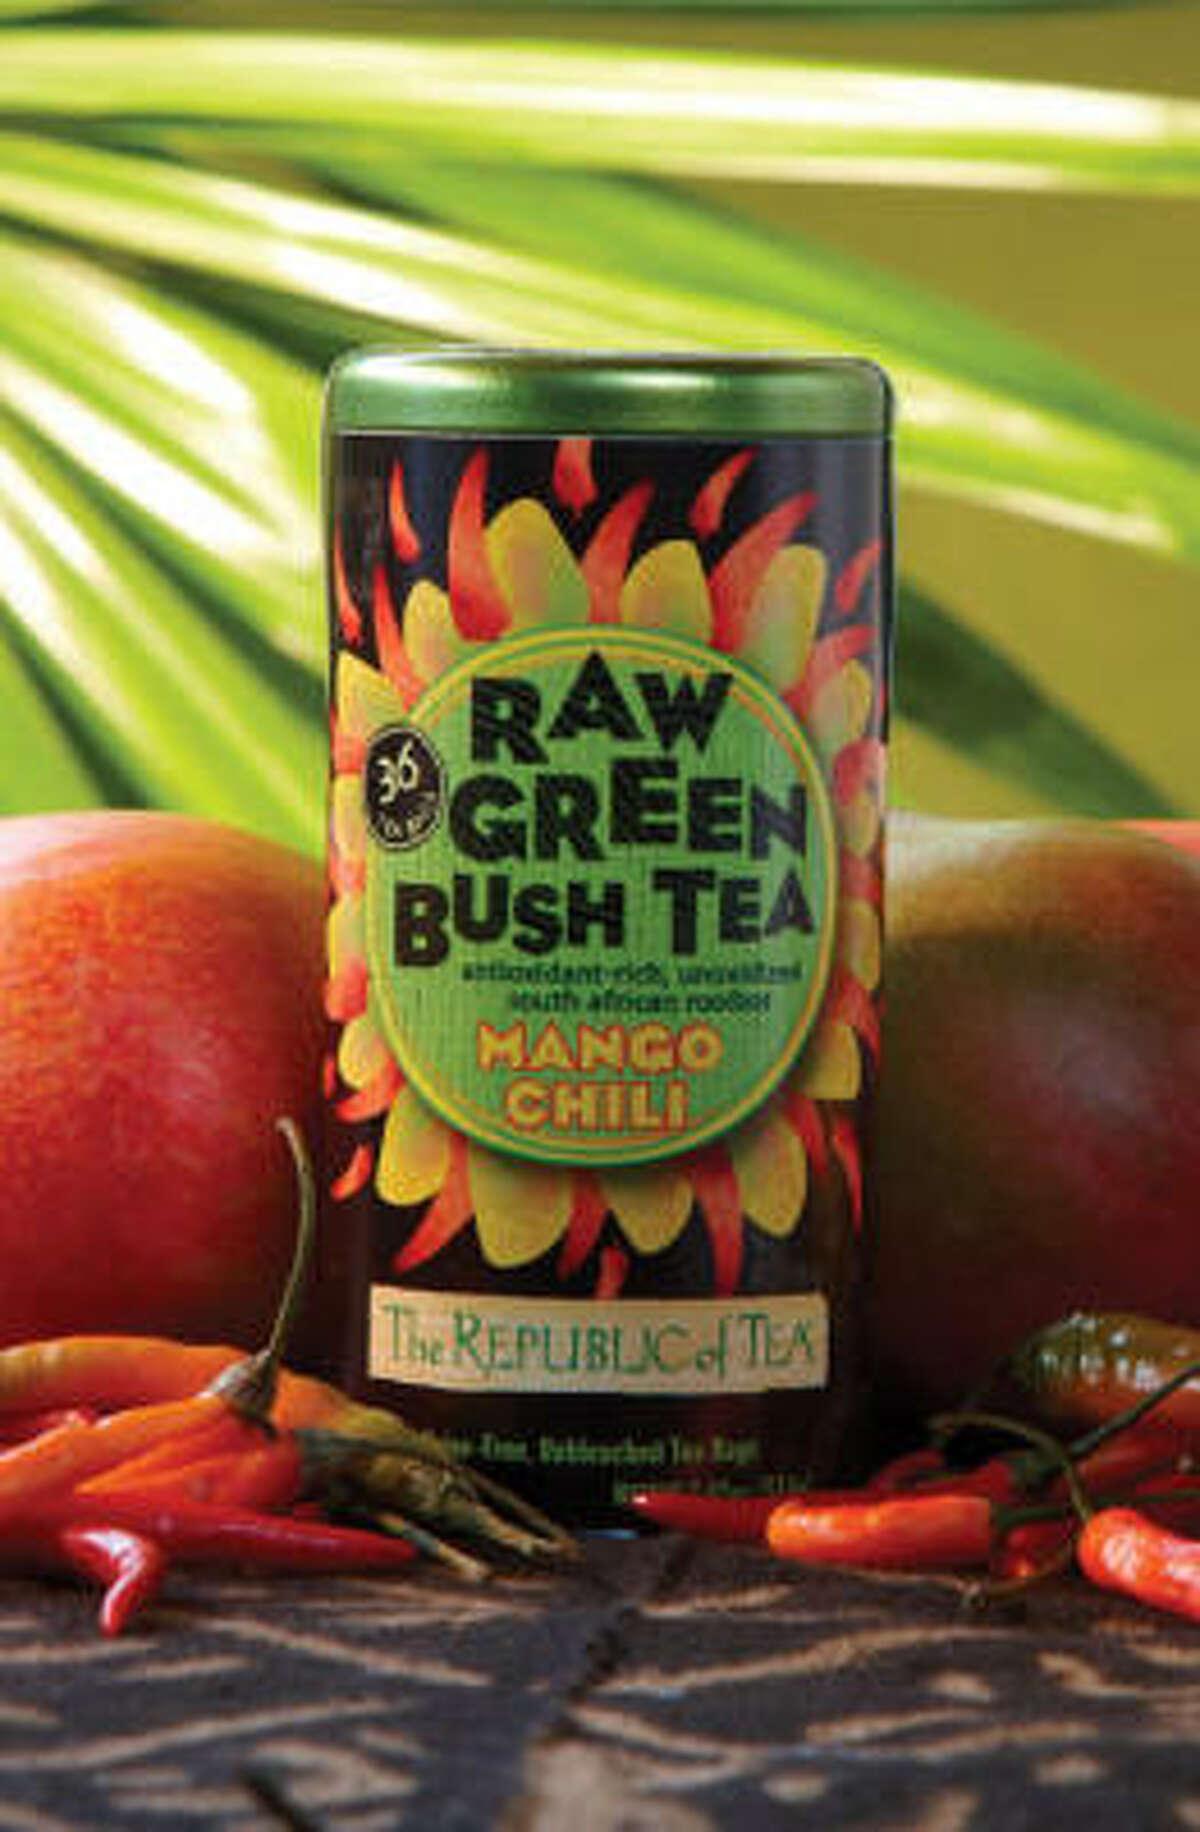 Republic of Tea's new Raw Green Bush Tea Collection includes Mango Chili tea.